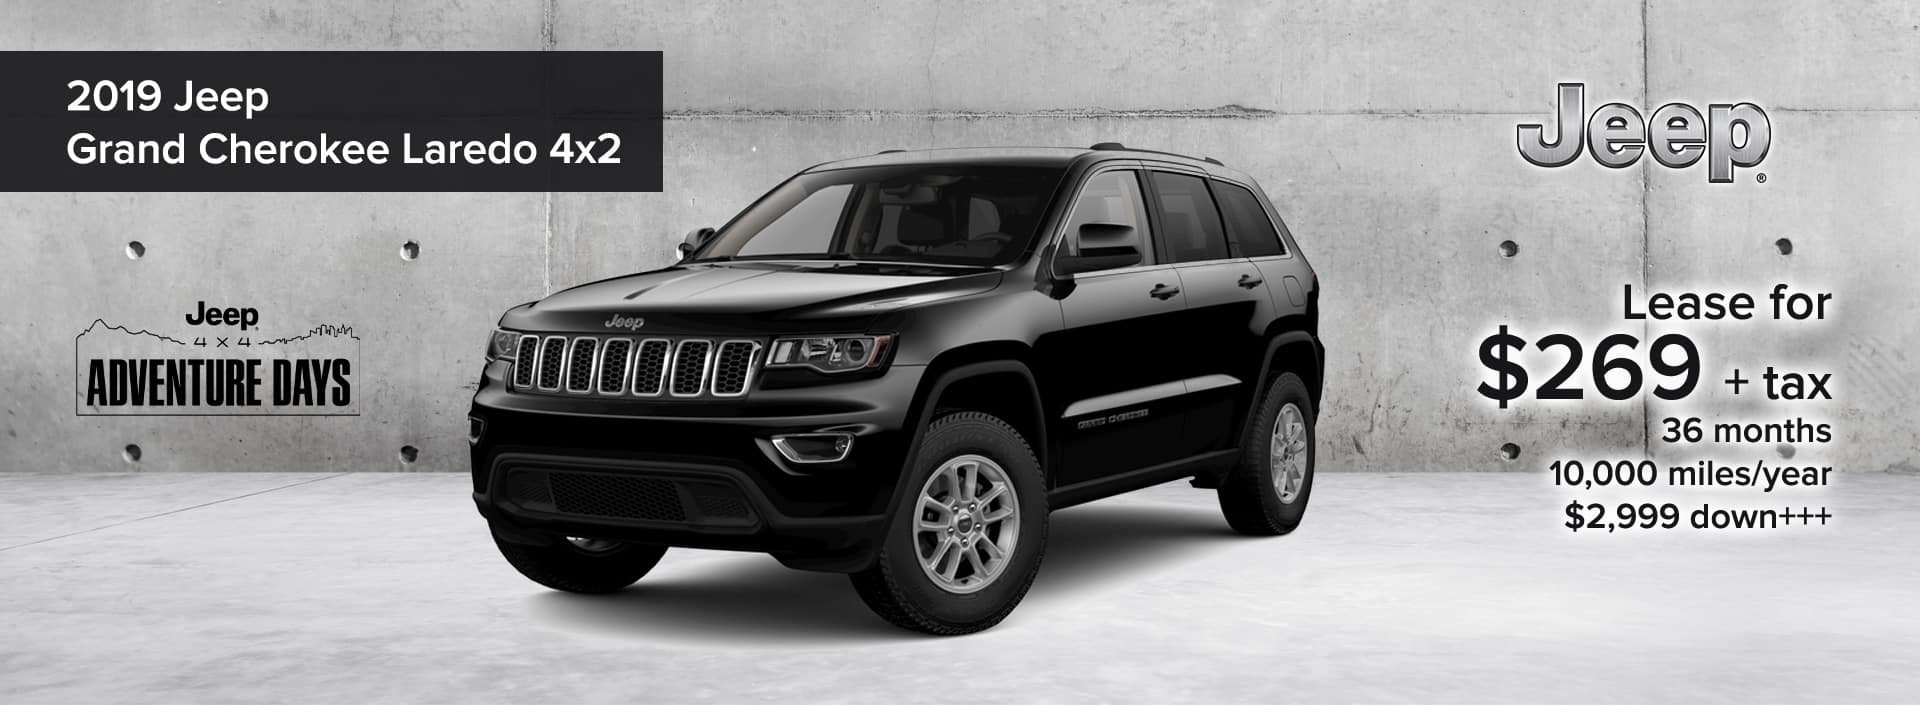 2020 Jeep Grand Cherokee Laredo 4x2 Jeep 4x4 Adventure Days Lease Deal